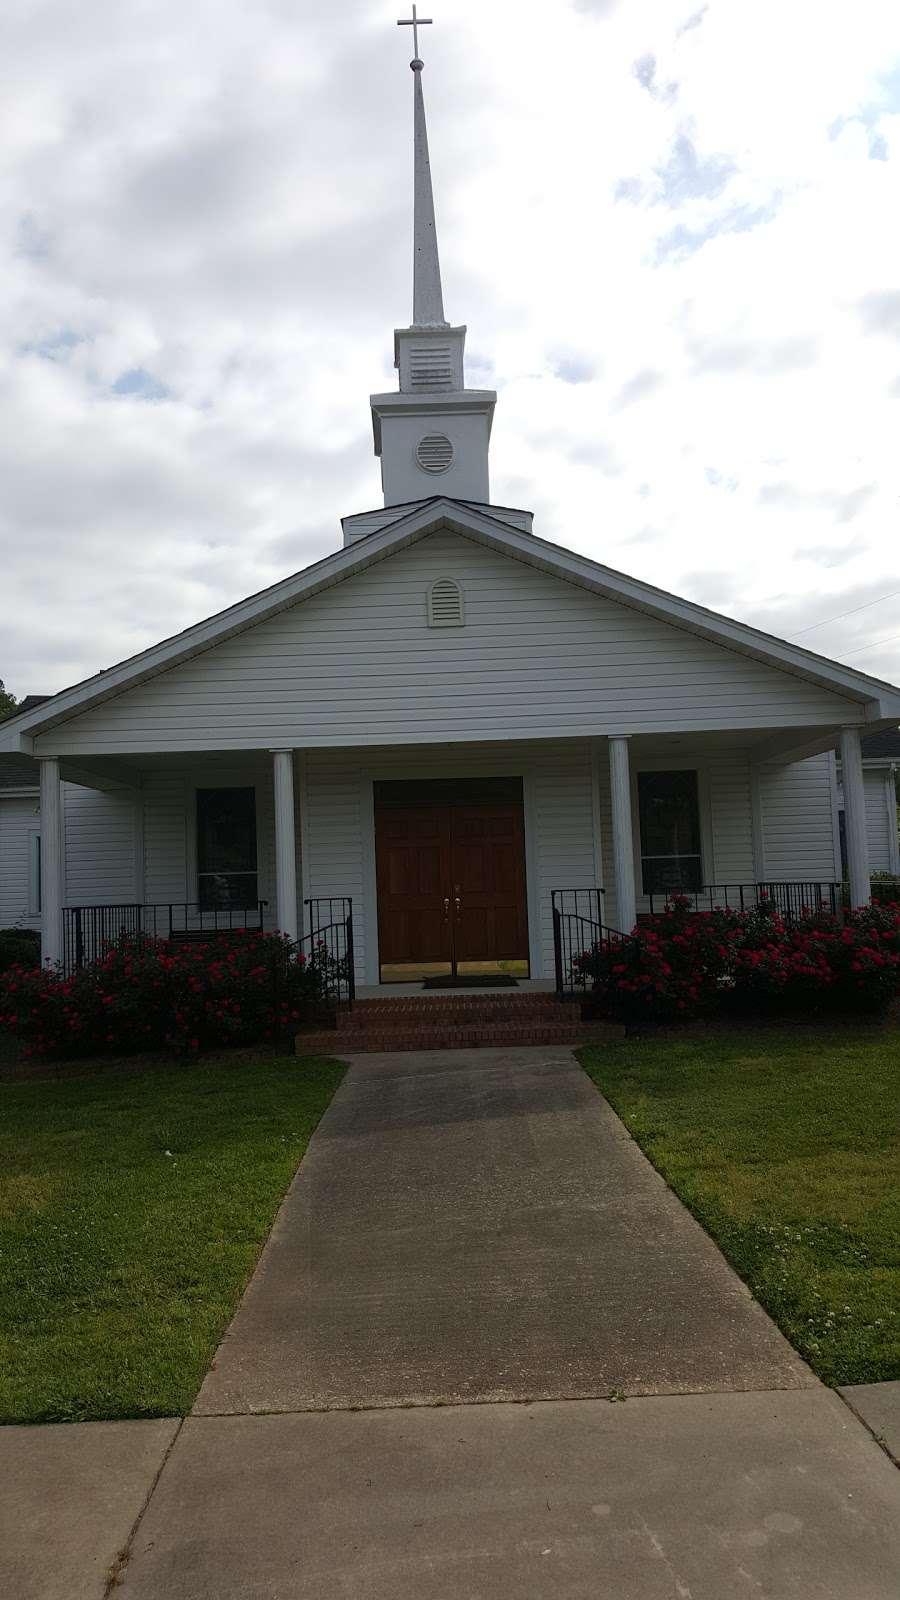 Oakdale Church - church  | Photo 1 of 1 | Address: 3304 NC-218, Polkton, NC 28135, USA